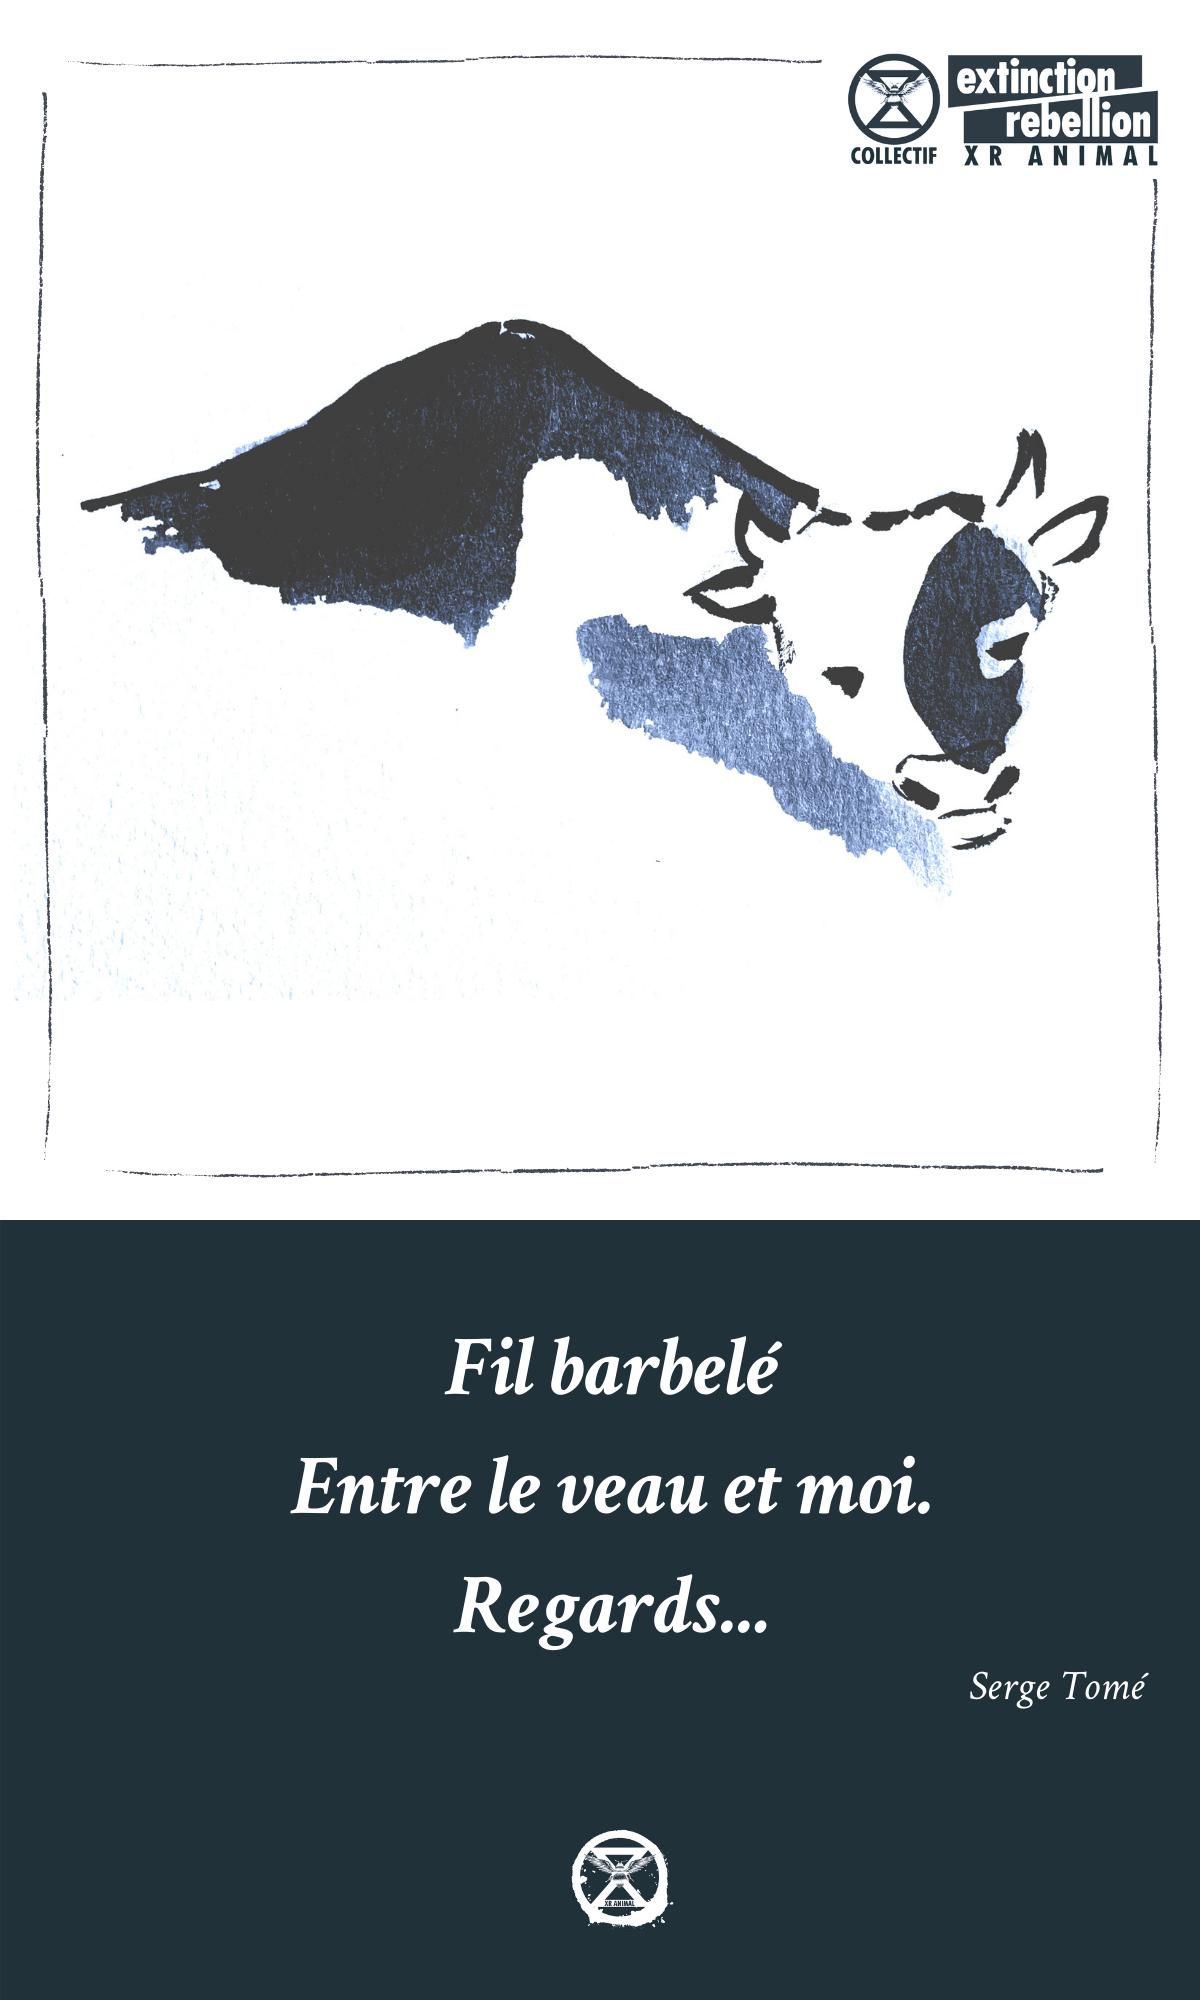 xranimal-vache-5-min